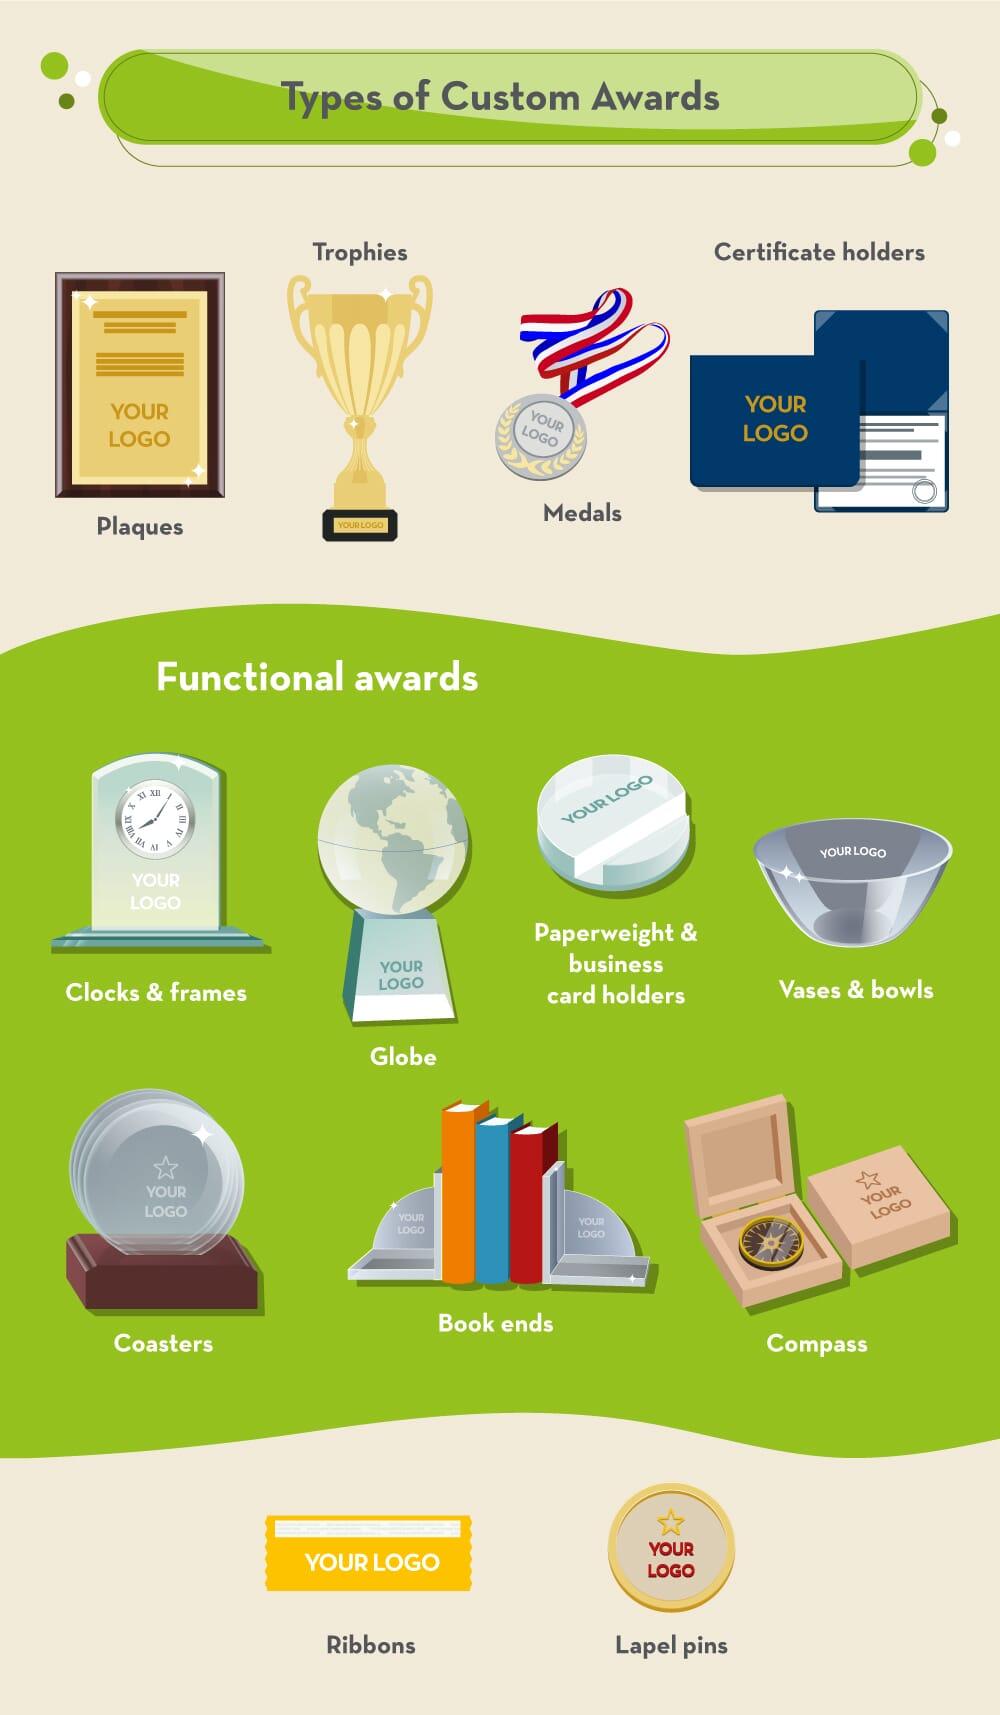 Custom awards infographic